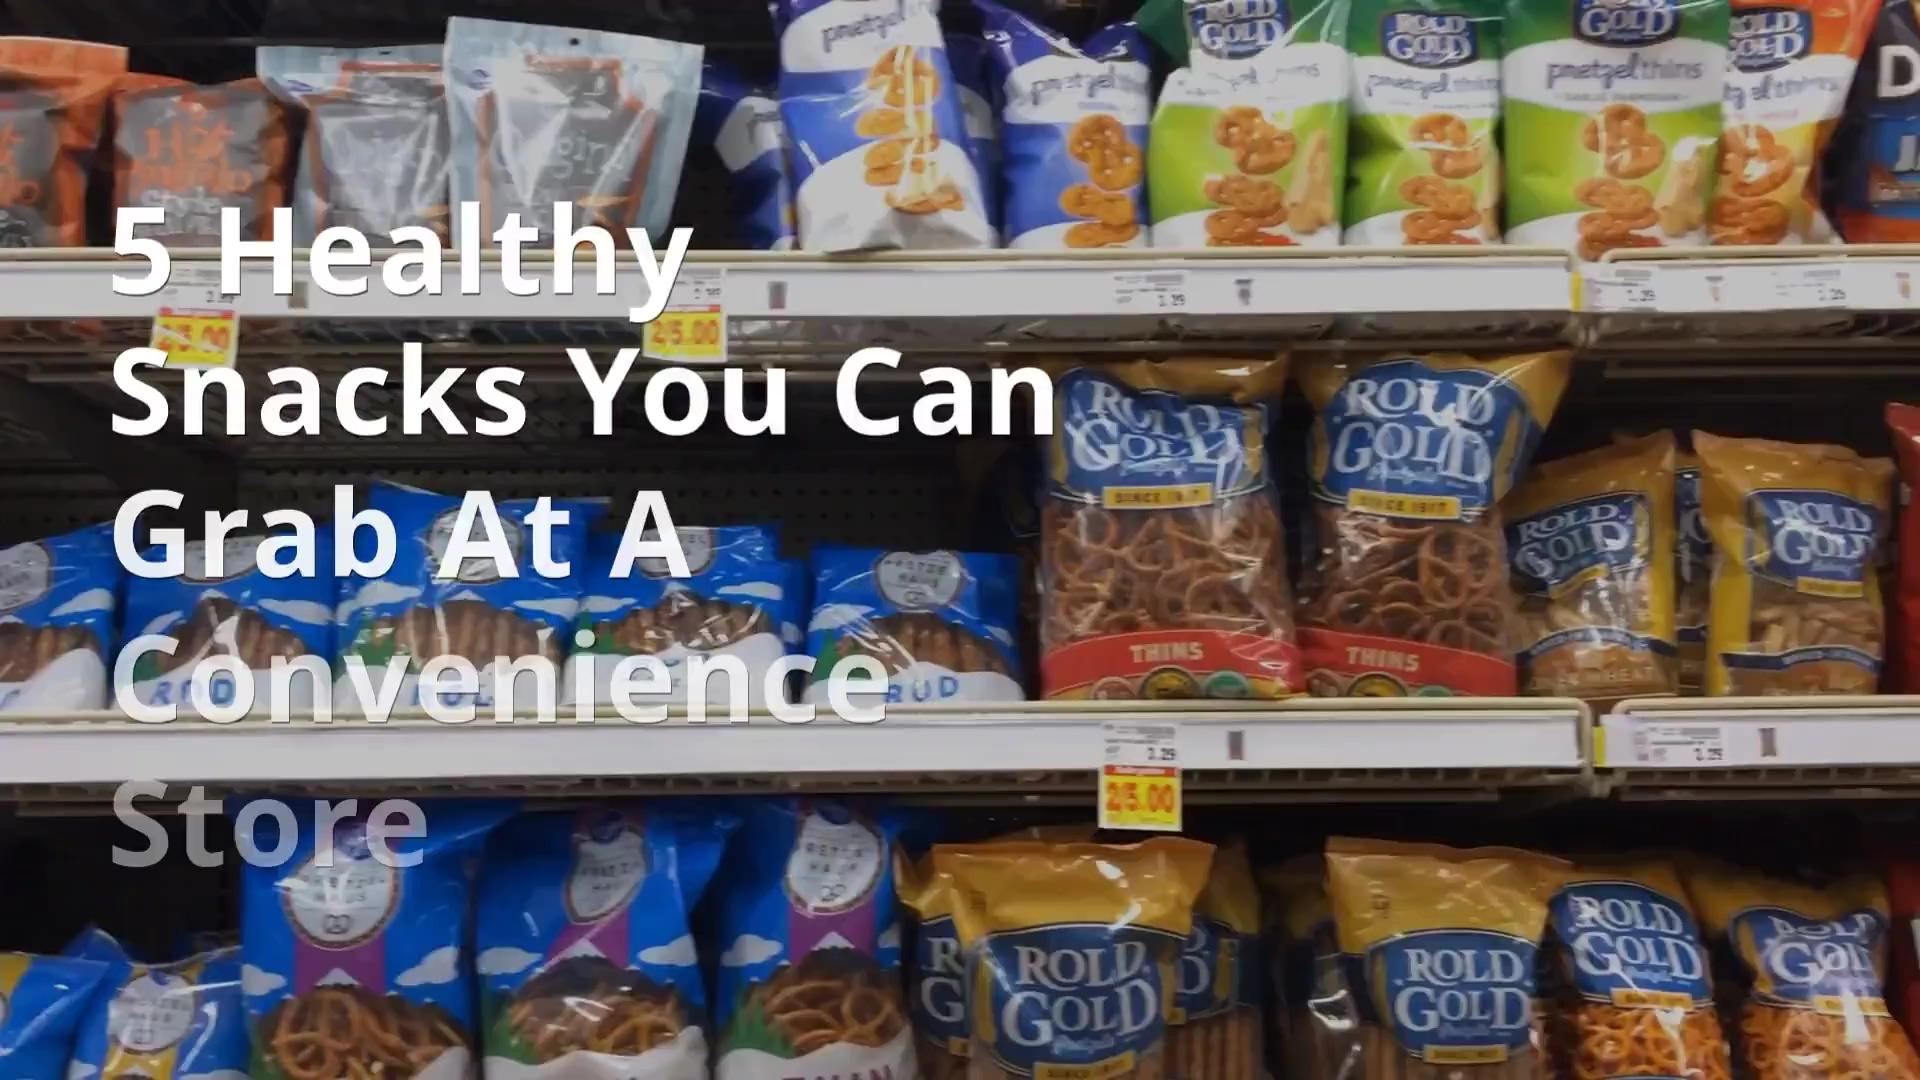 5-healthy-convenience-store-snacks(matrix)